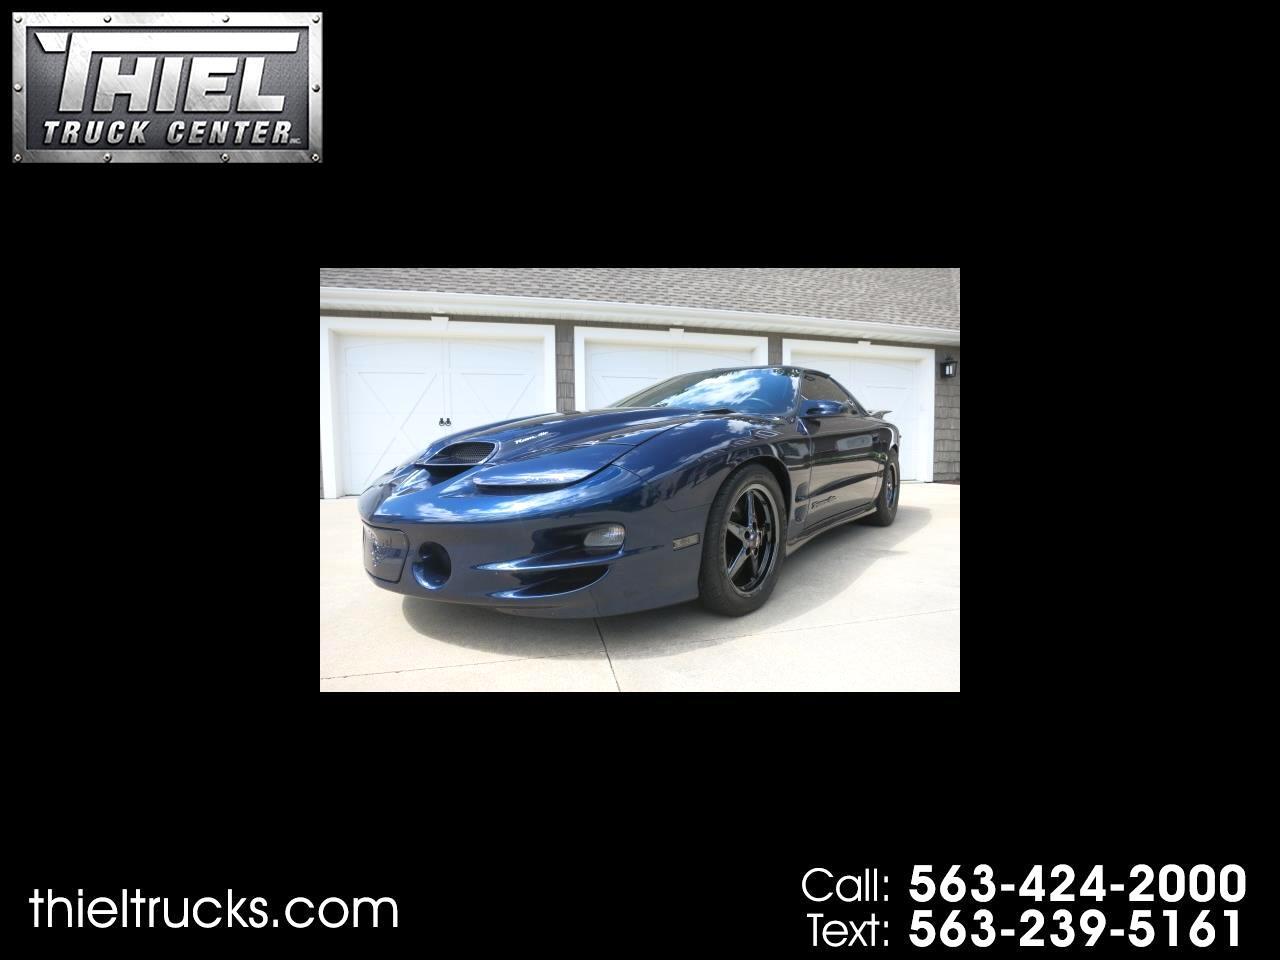 2002 Pontiac Firebird Trans Am WS6